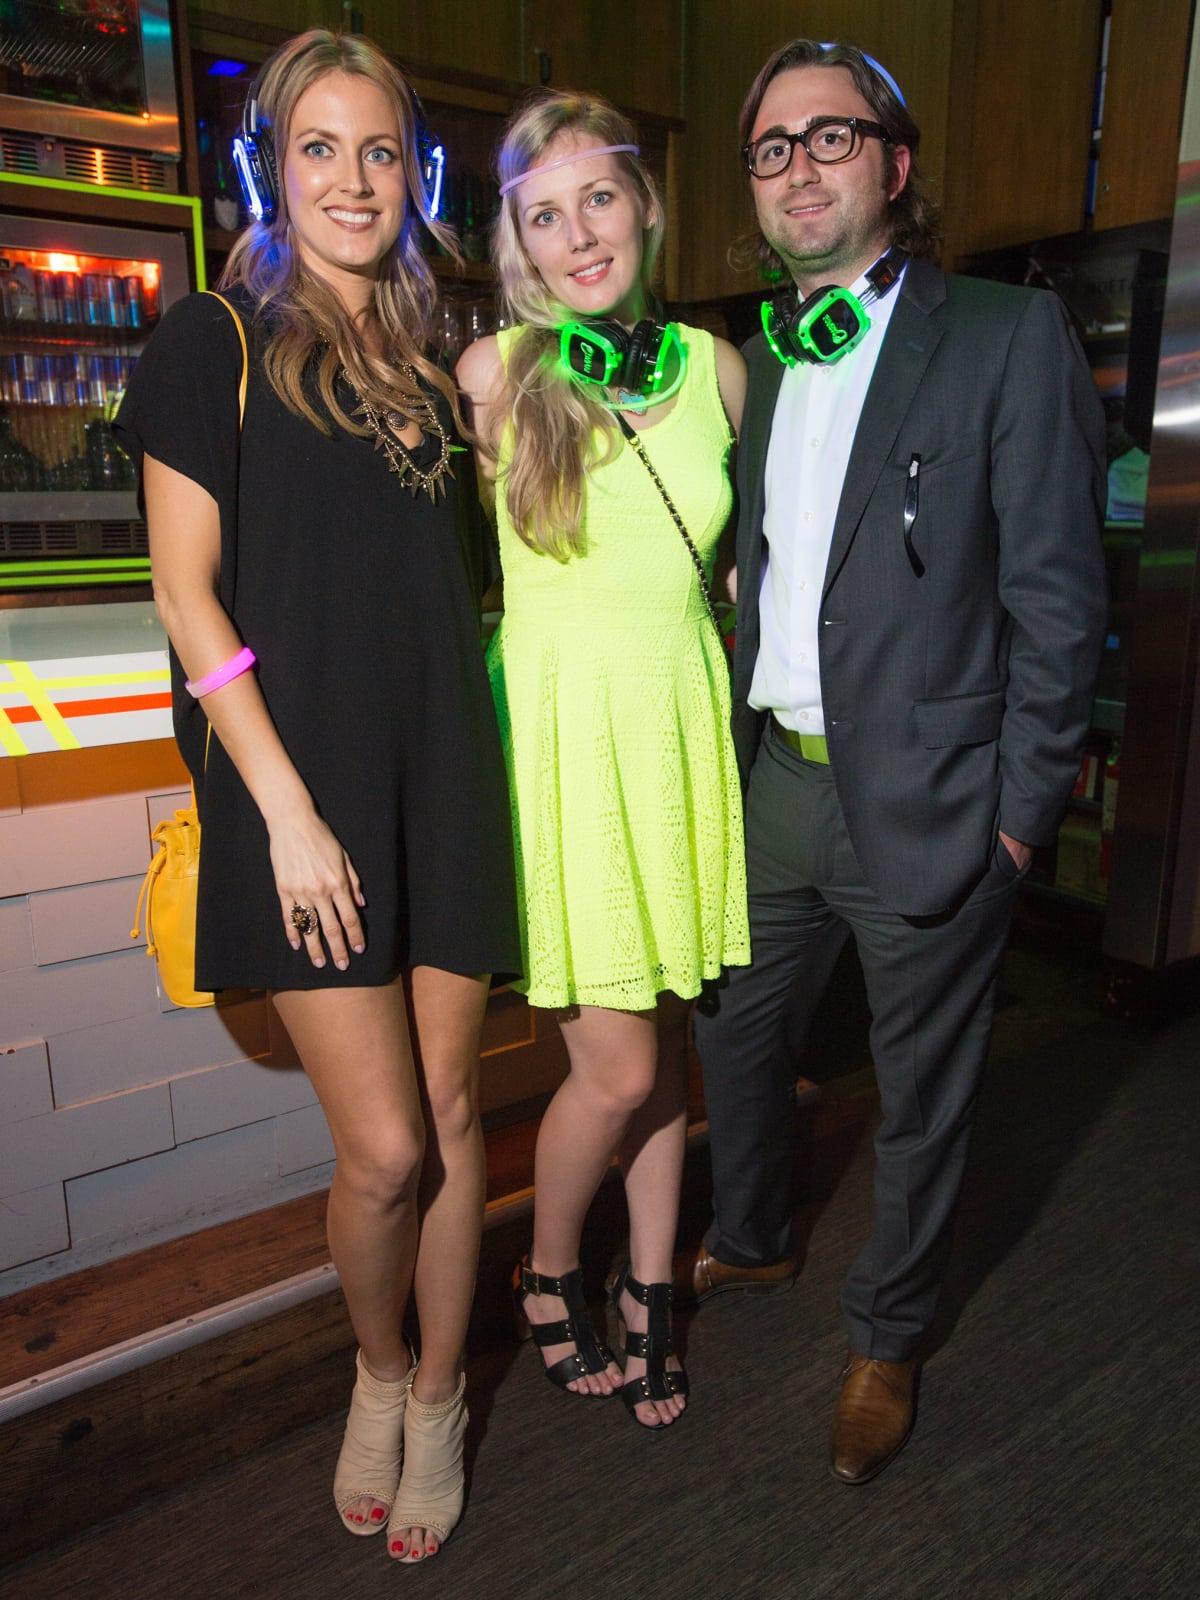 Lauren Mason, Kristen Johnson, Michael Graska